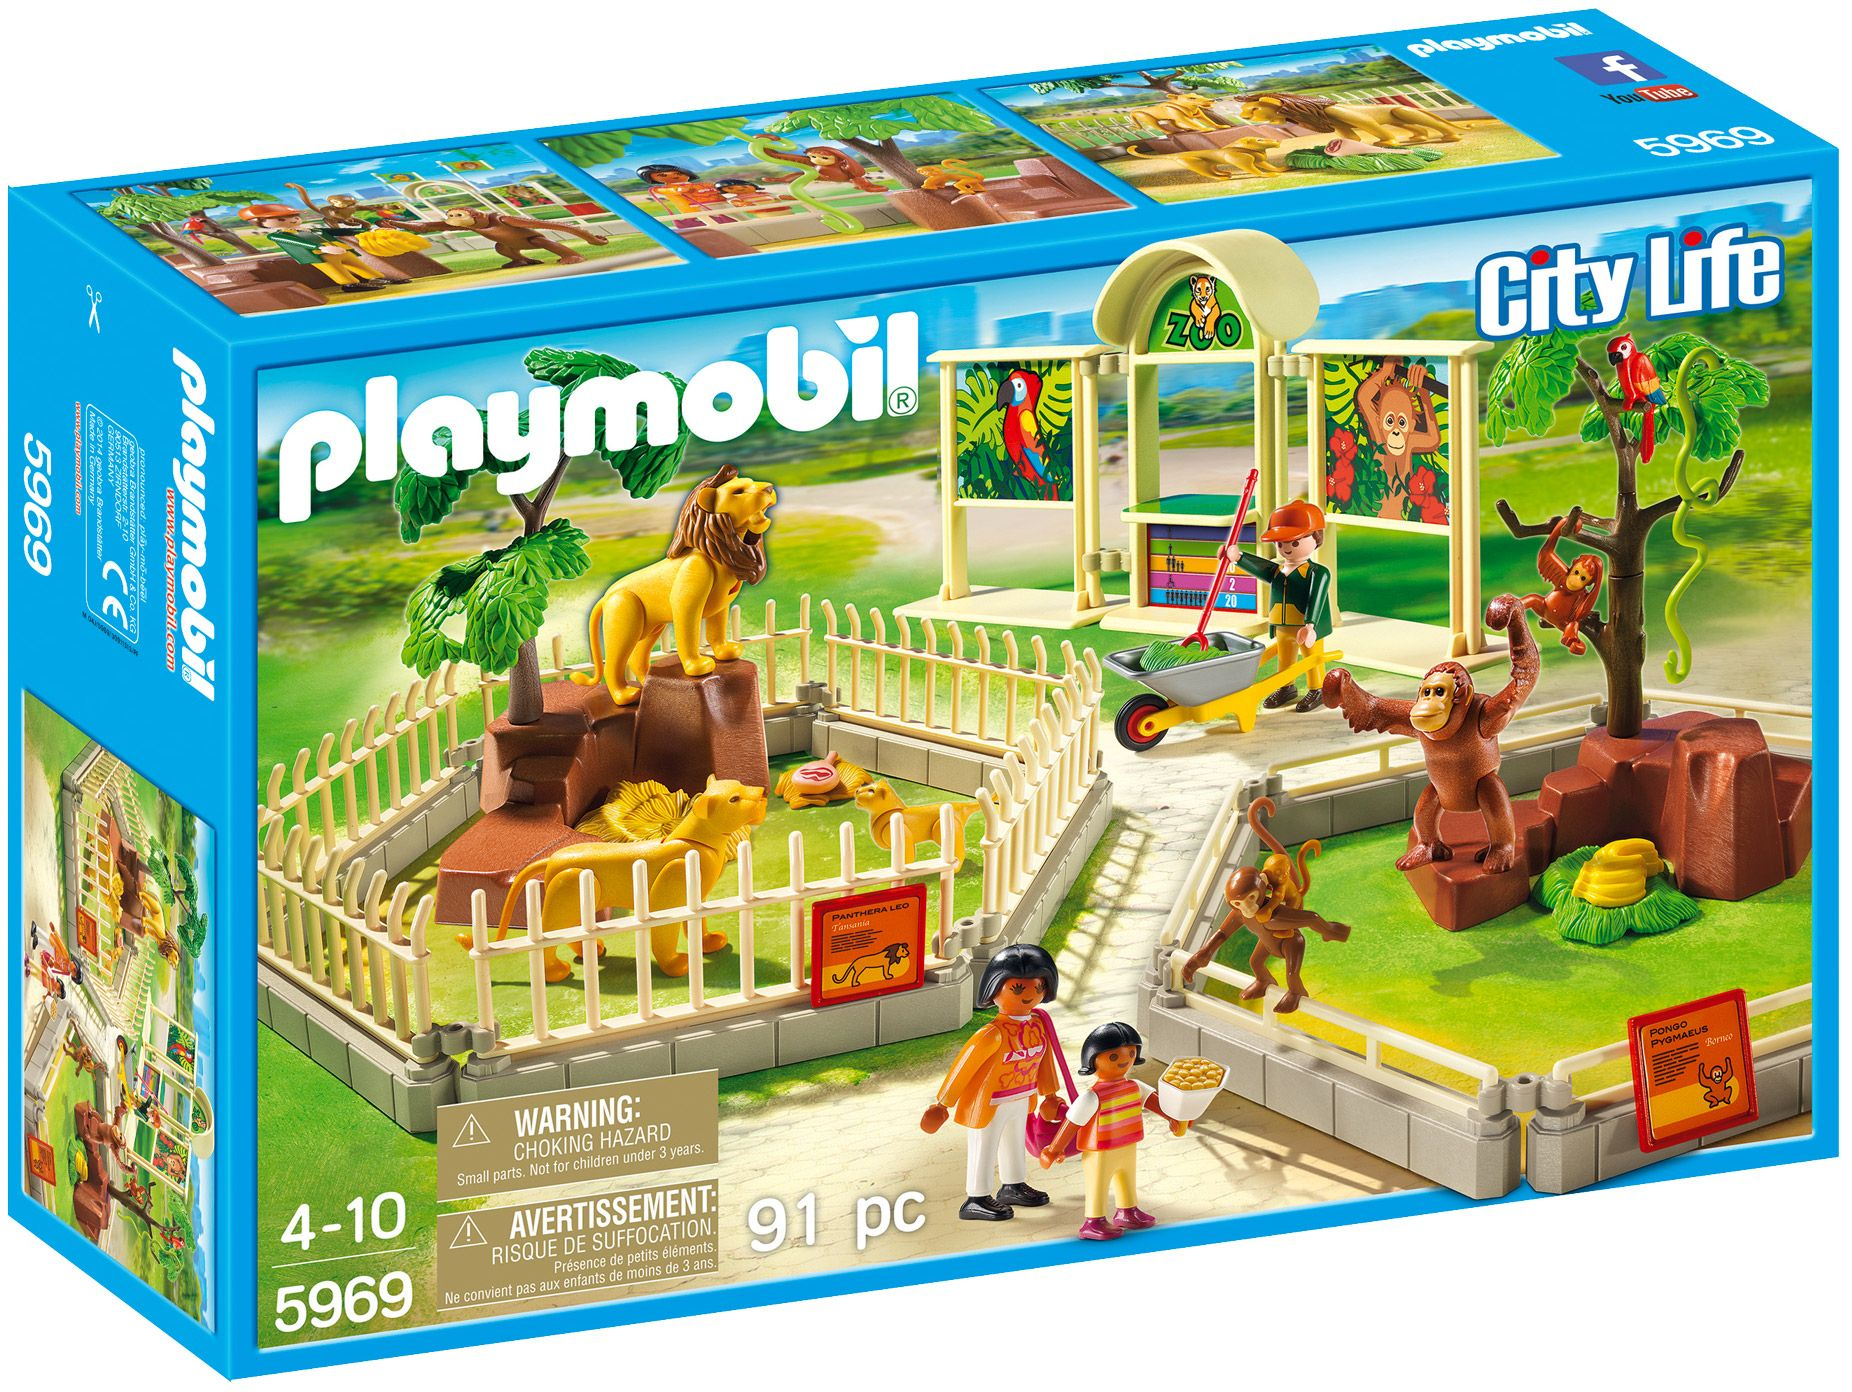 Playmobil City Life 5969 : Le Grand Zoo | Le Zoo, Amazone ... concernant Playmobil Jardin D Enfant